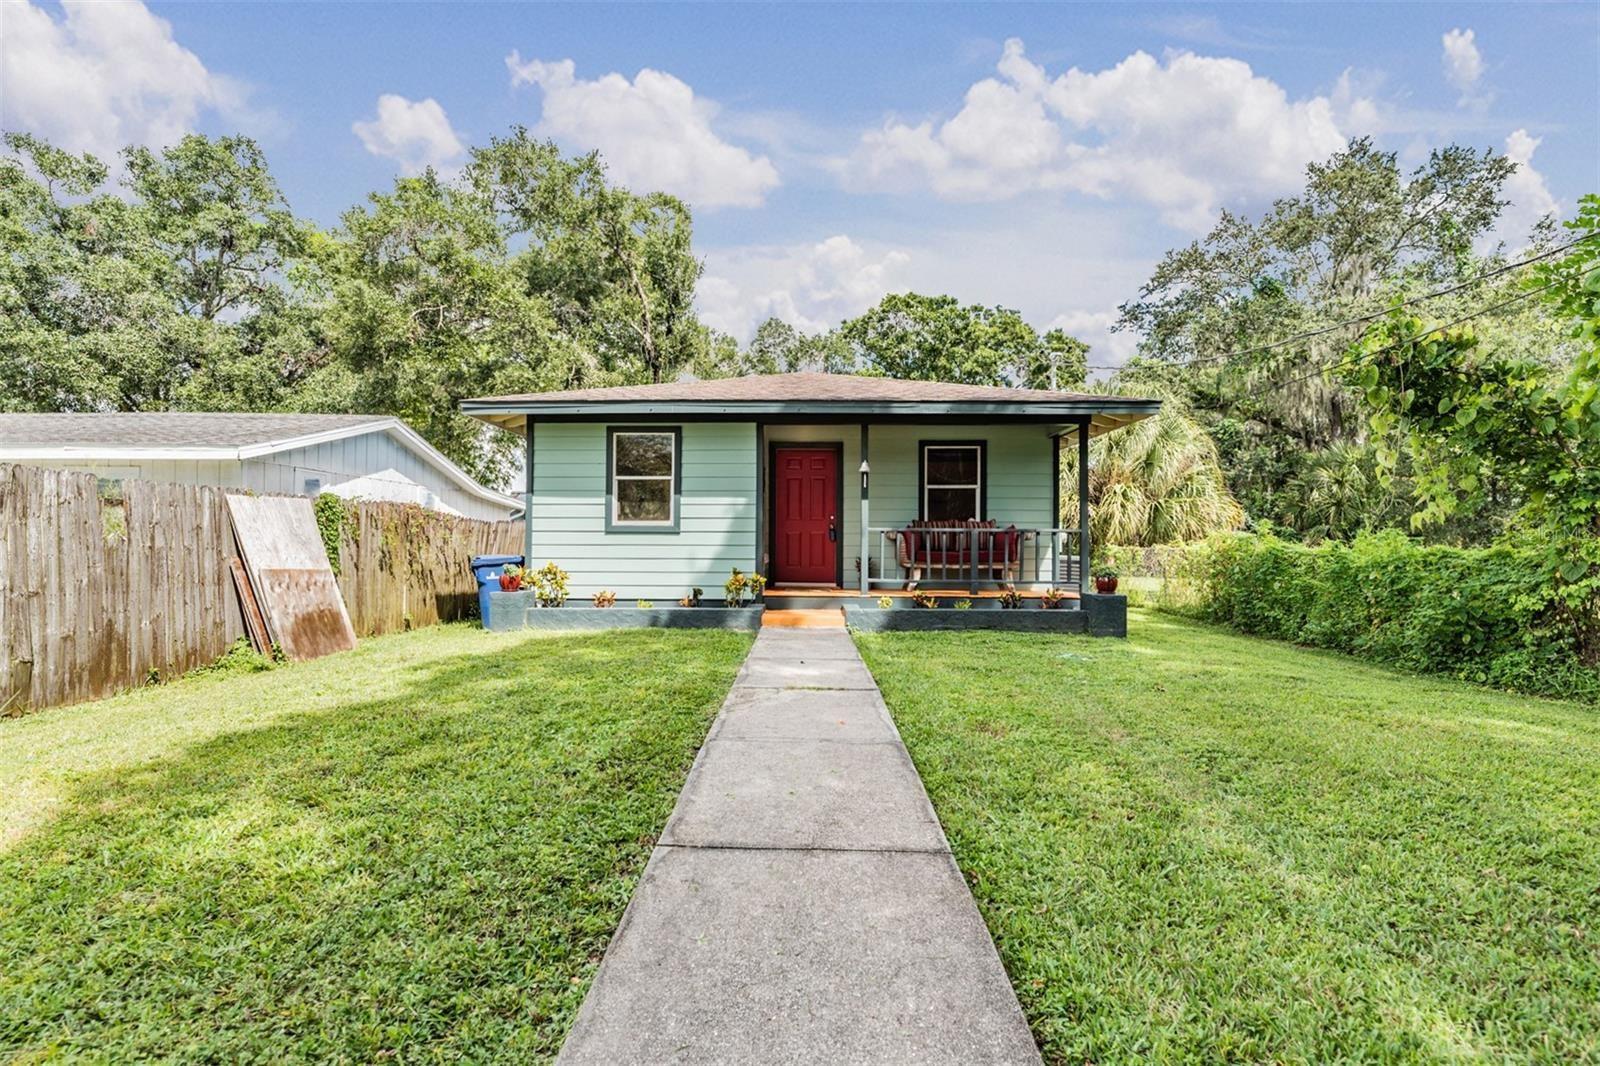 847 HAND AVENUE, Sarasota, FL 34232 - #: W7837096